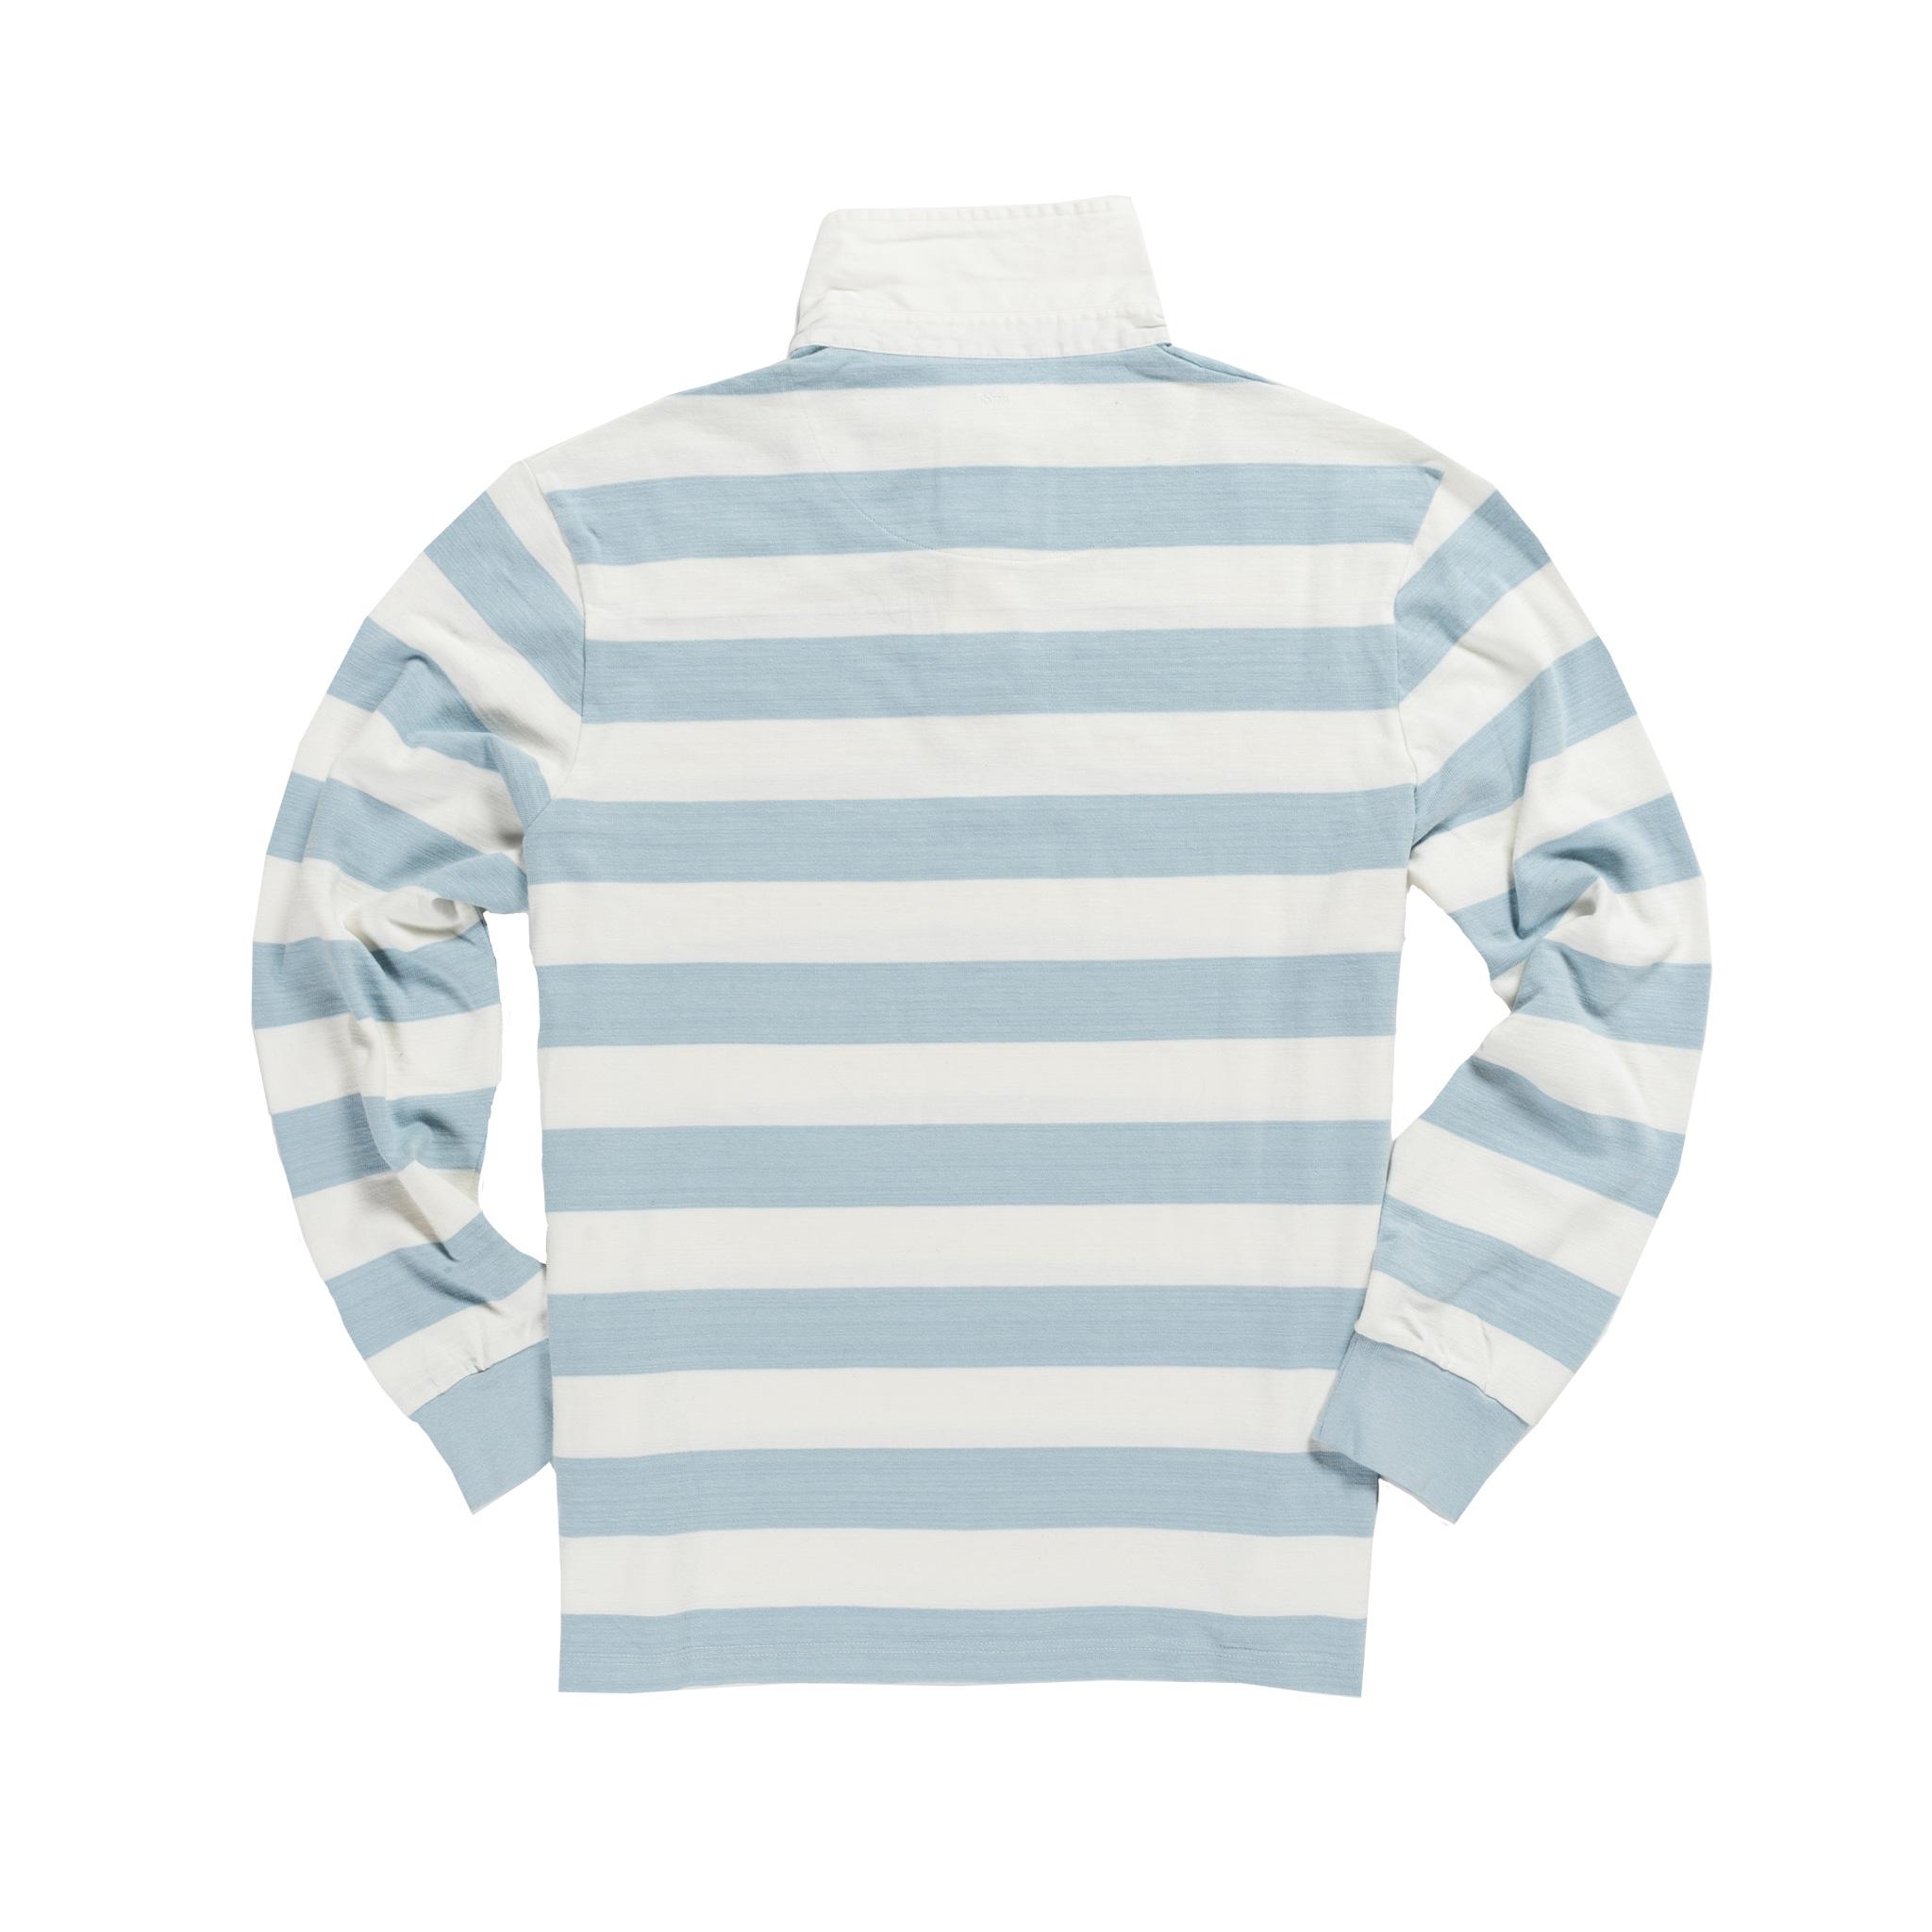 Cambridge 1872 Vintage Rugby Shirt